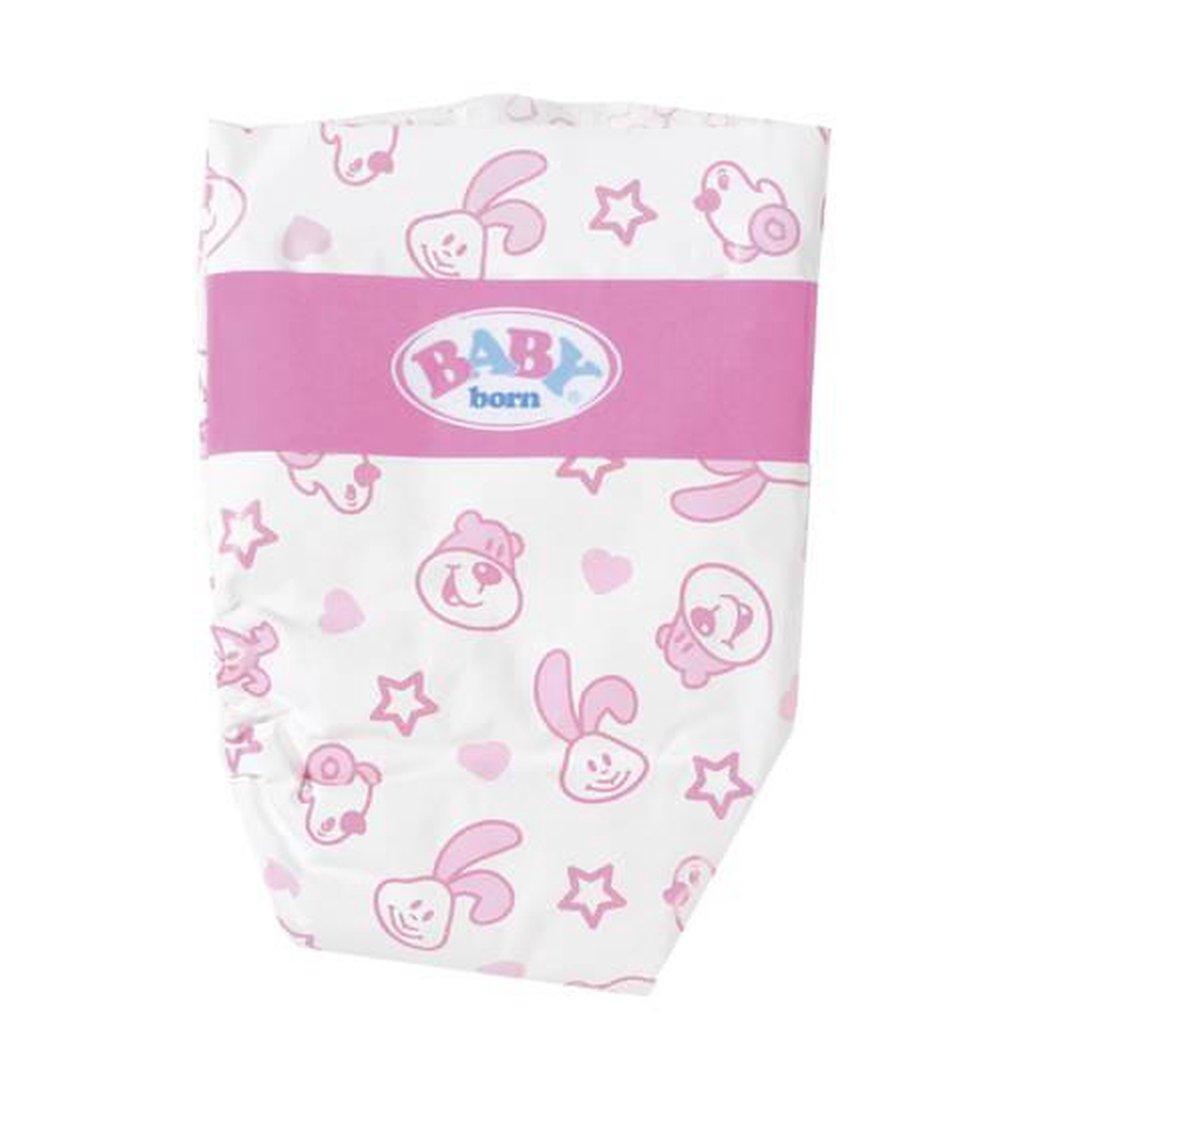 BABY born Luiers - 5 pack